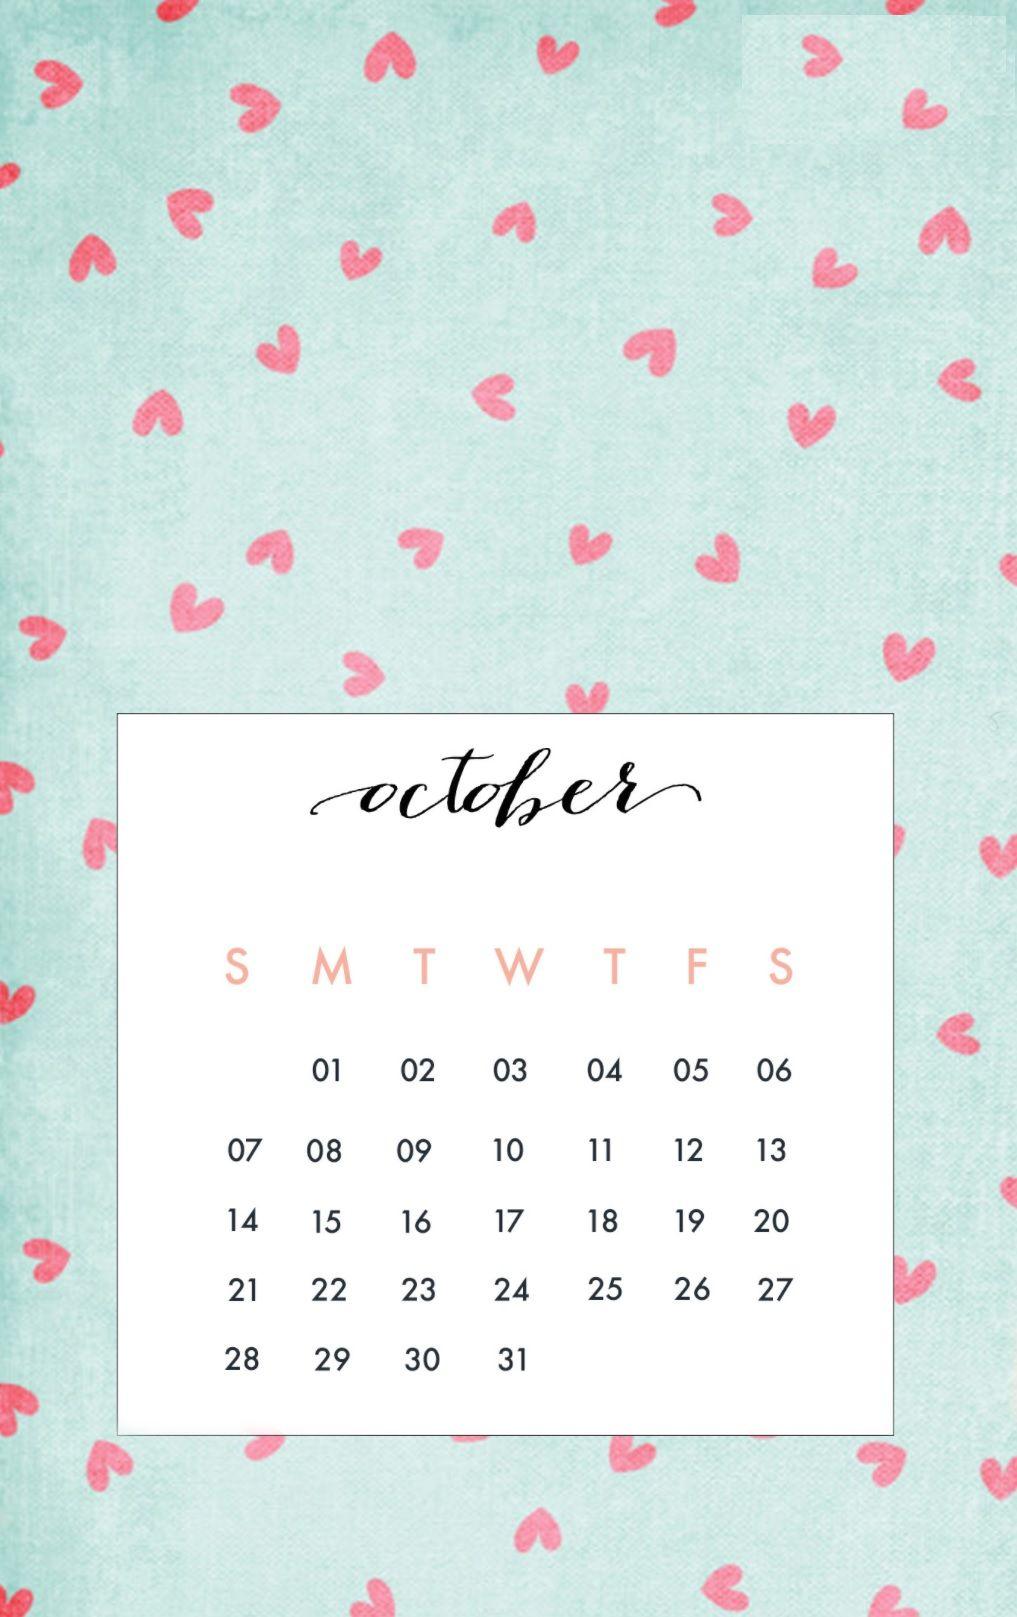 October 2018 iPhone Calendar Wallpapers | Calendar 2018 | Calendar wallpaper, Calendar wallpaper ...